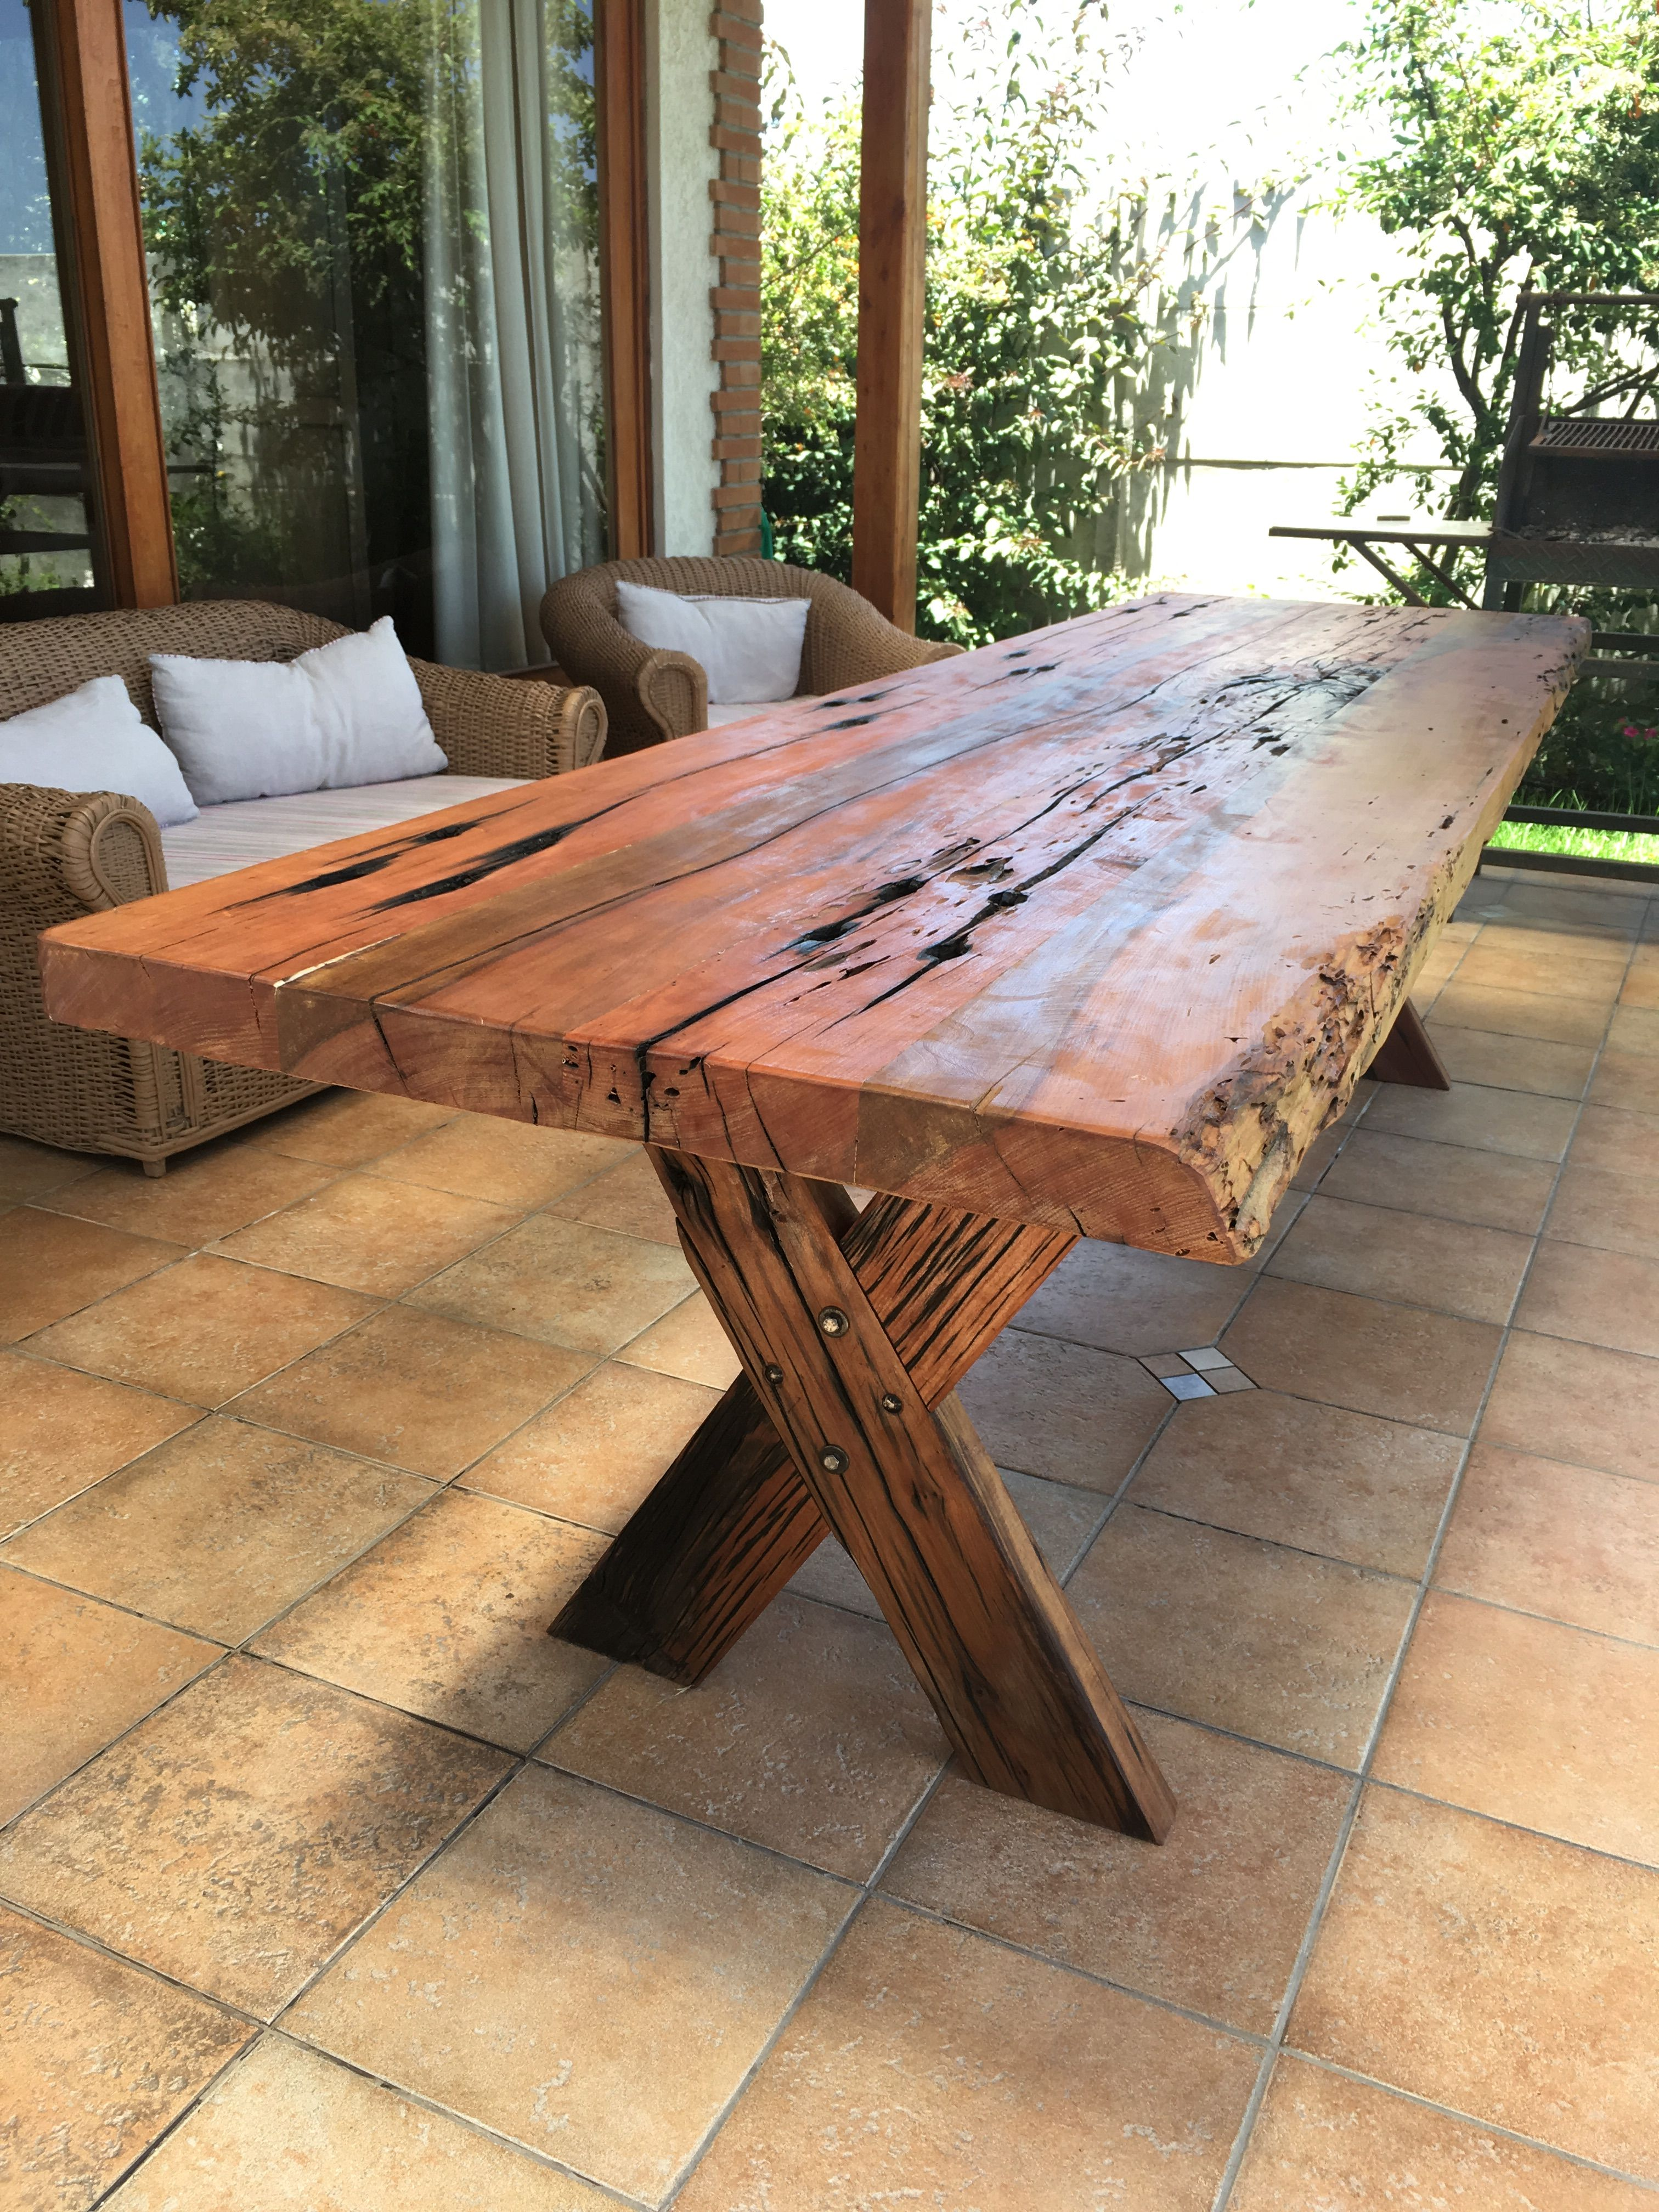 Mesa r stica de durmientes de roble ideal para quincho o - Mesas de cocina rusticas ...